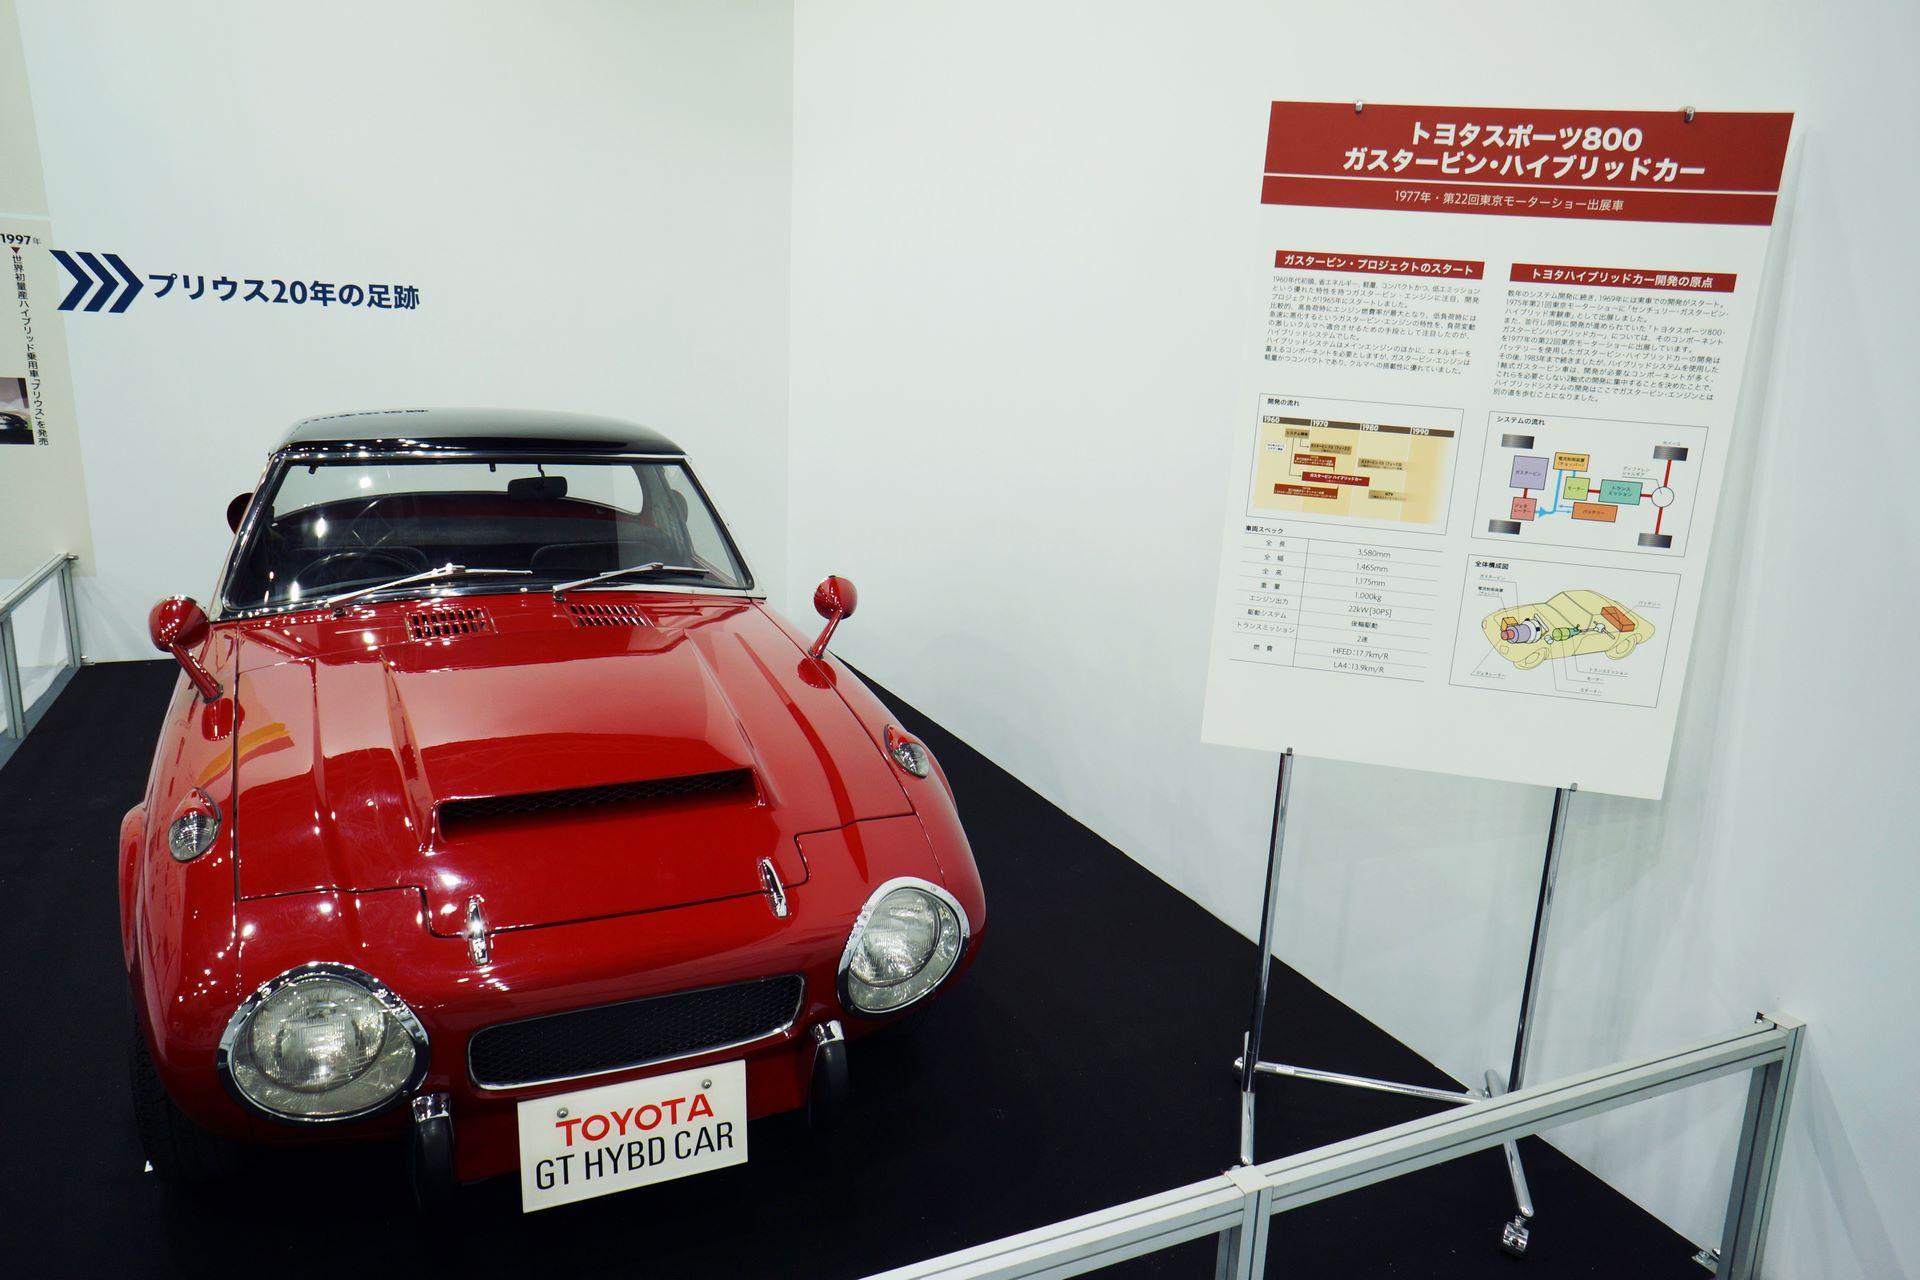 Toyota-Sports-800-Gas-Turbine-Hybrid-concept-1977-2